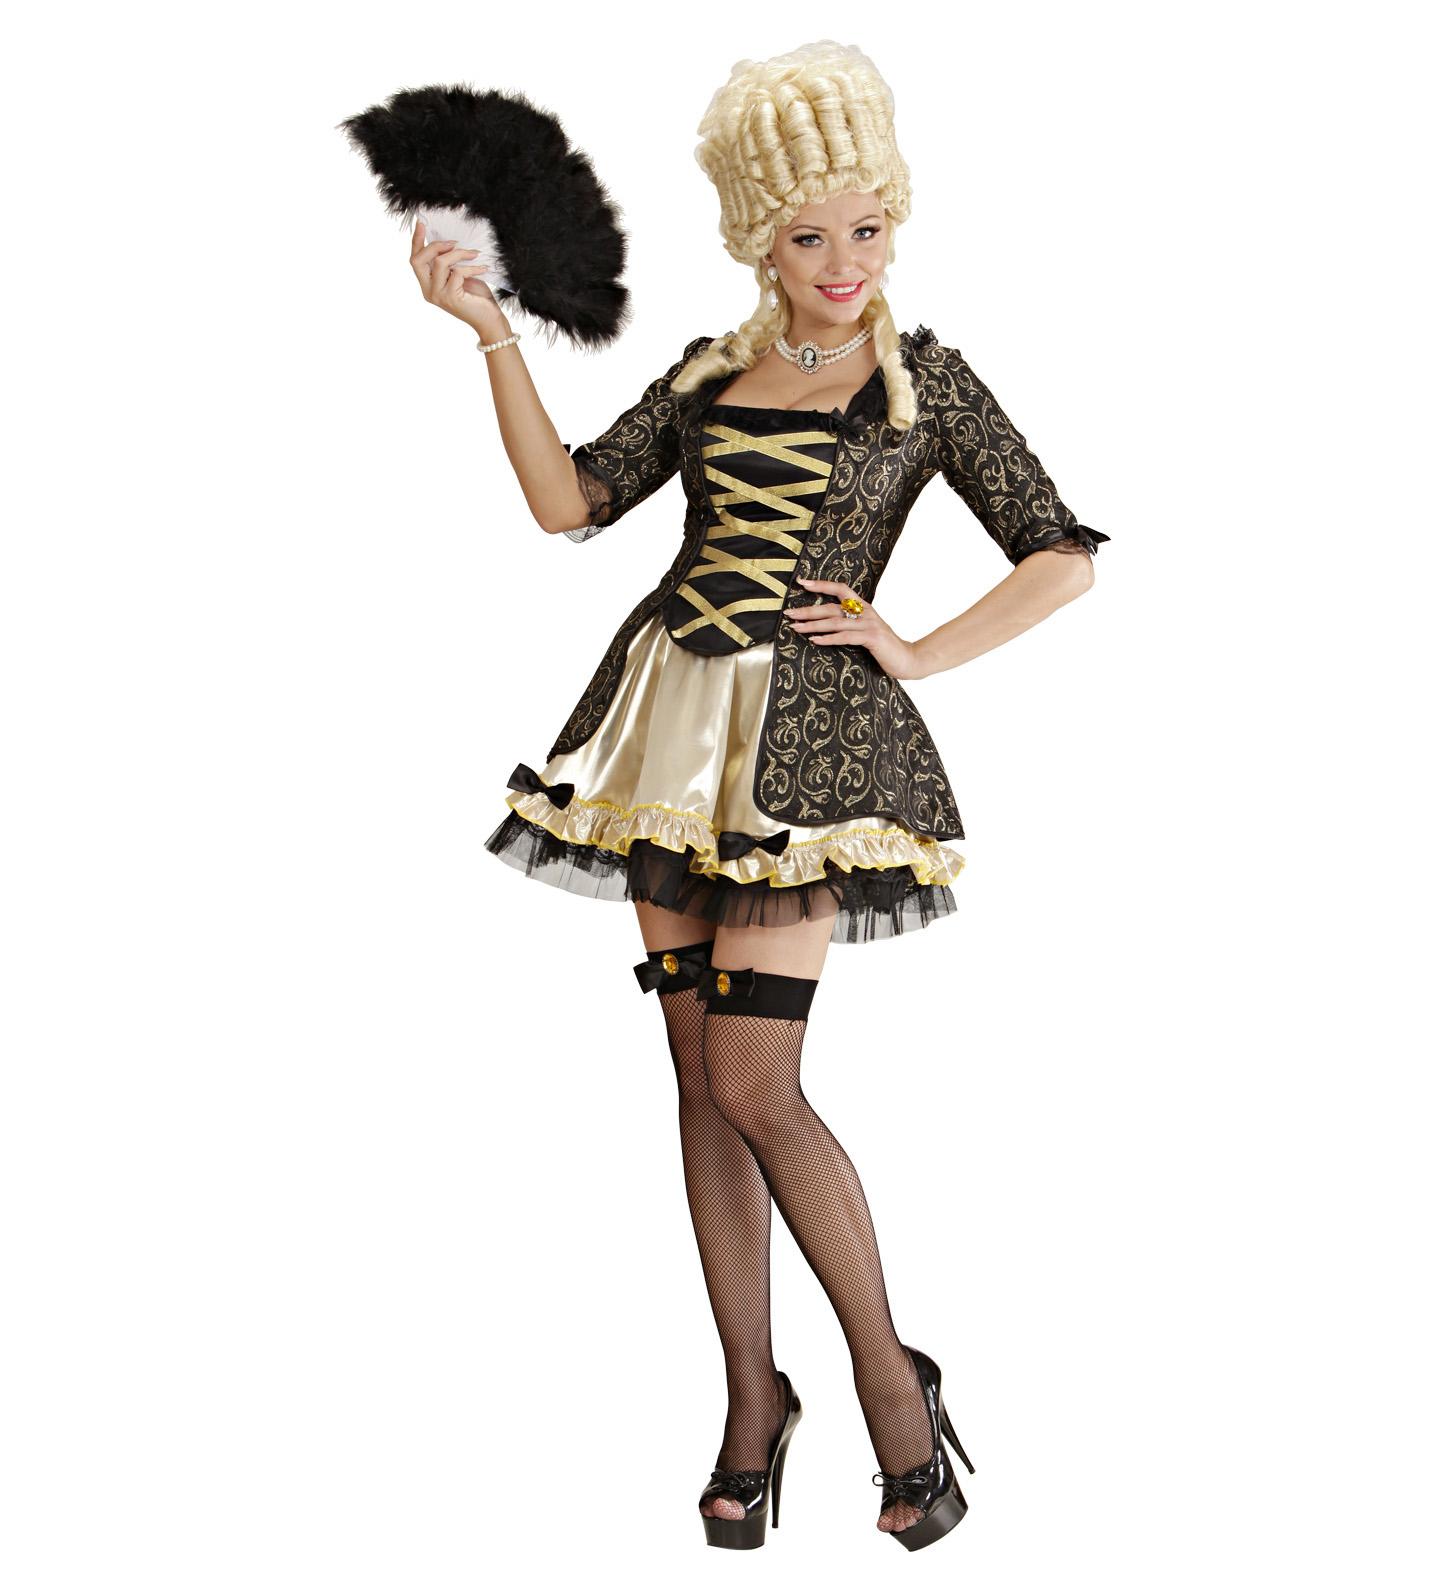 Ladies Black Baroque Queen Dress Petticoat Fishnet Thigh Highs Costume